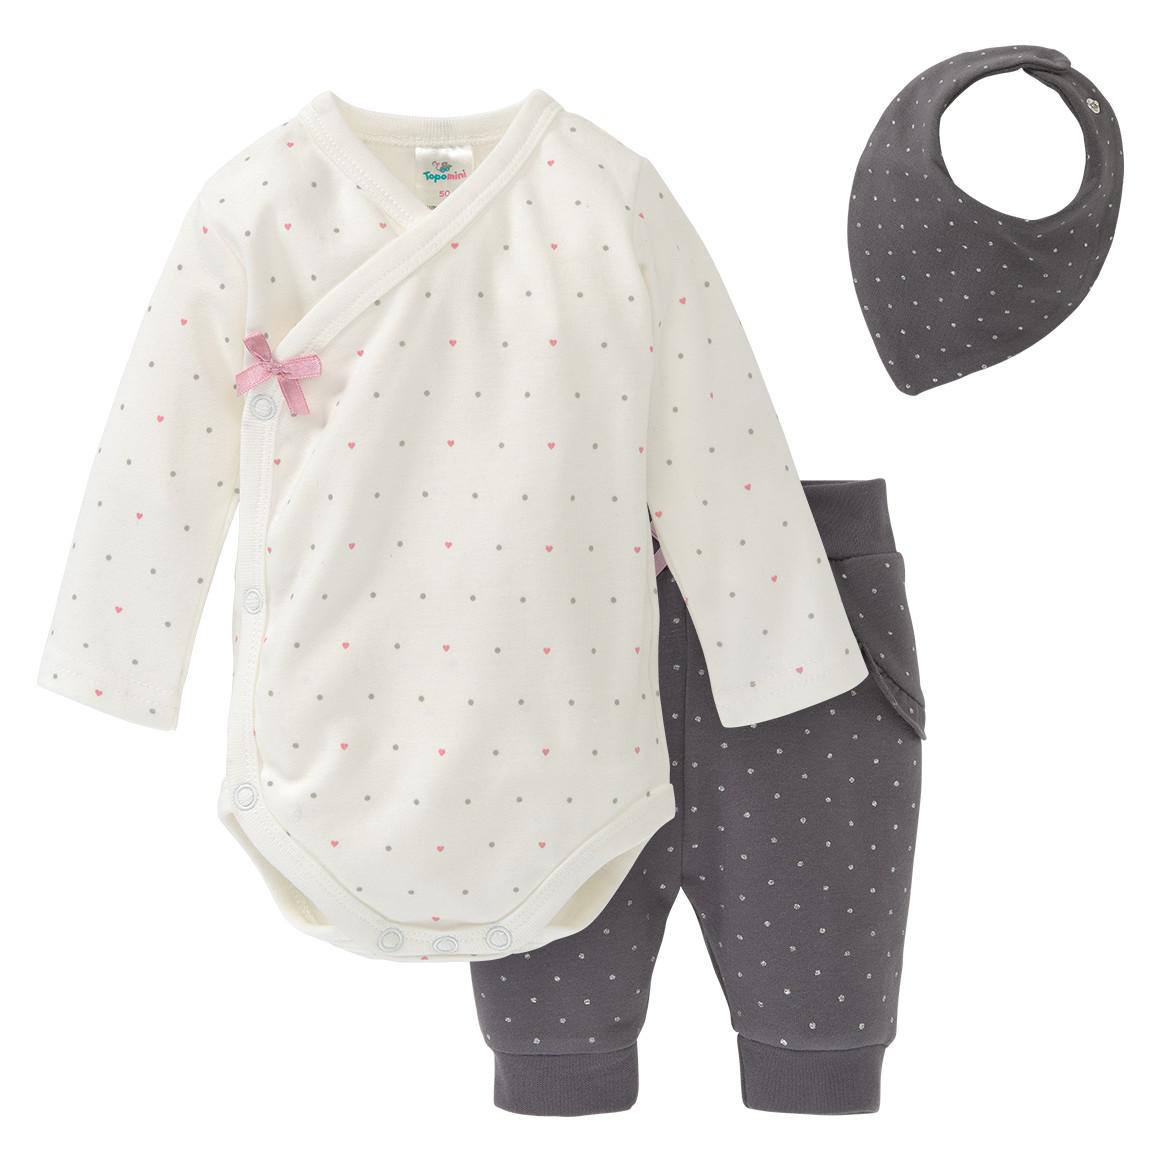 Babysets - Newborn Body, Jogginghose und Bandana im Set - Onlineshop Ernstings family